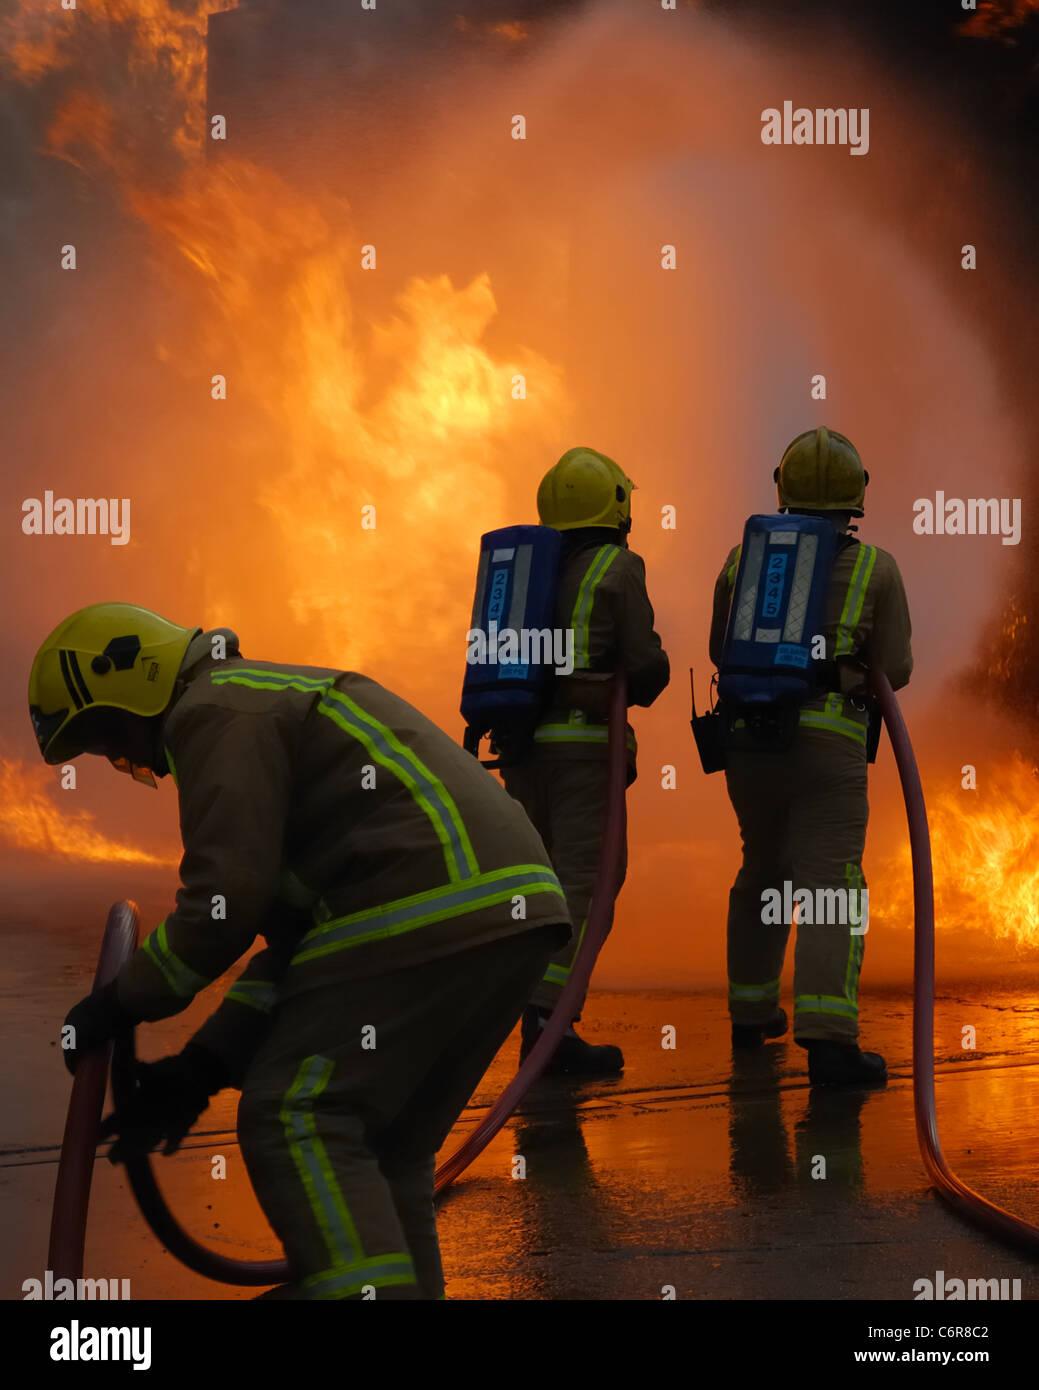 firefighters-fighting-fire-in-scotland-C6R8C2.jpg